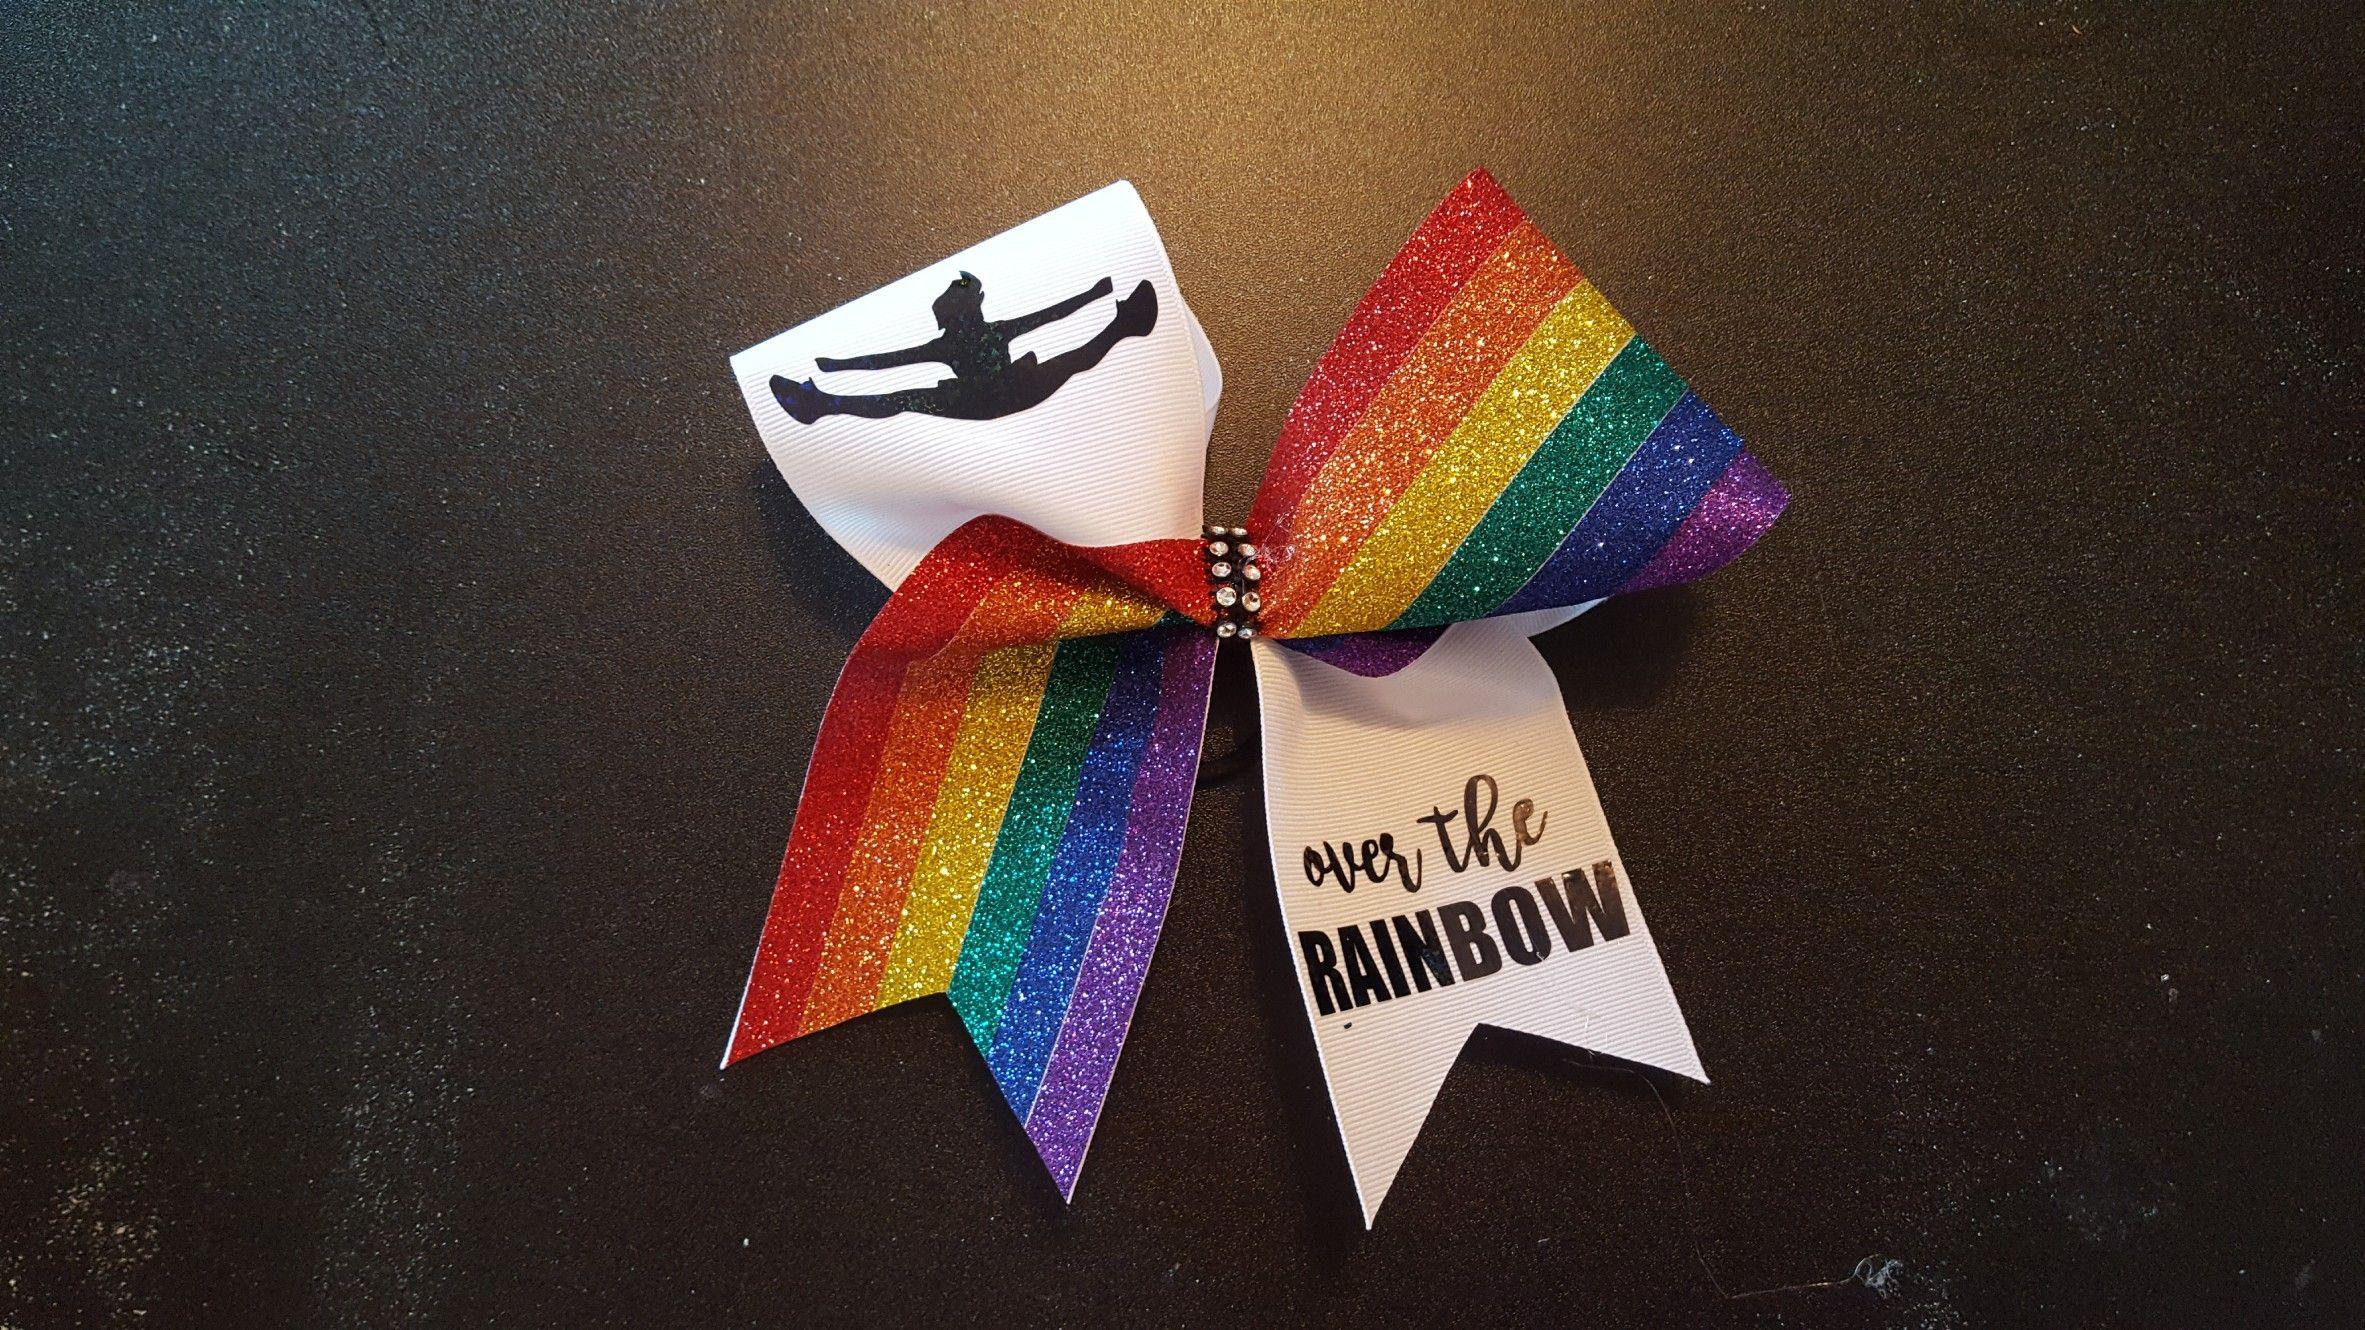 Pin by Melissa Burkett on Bowtique Over the rainbow